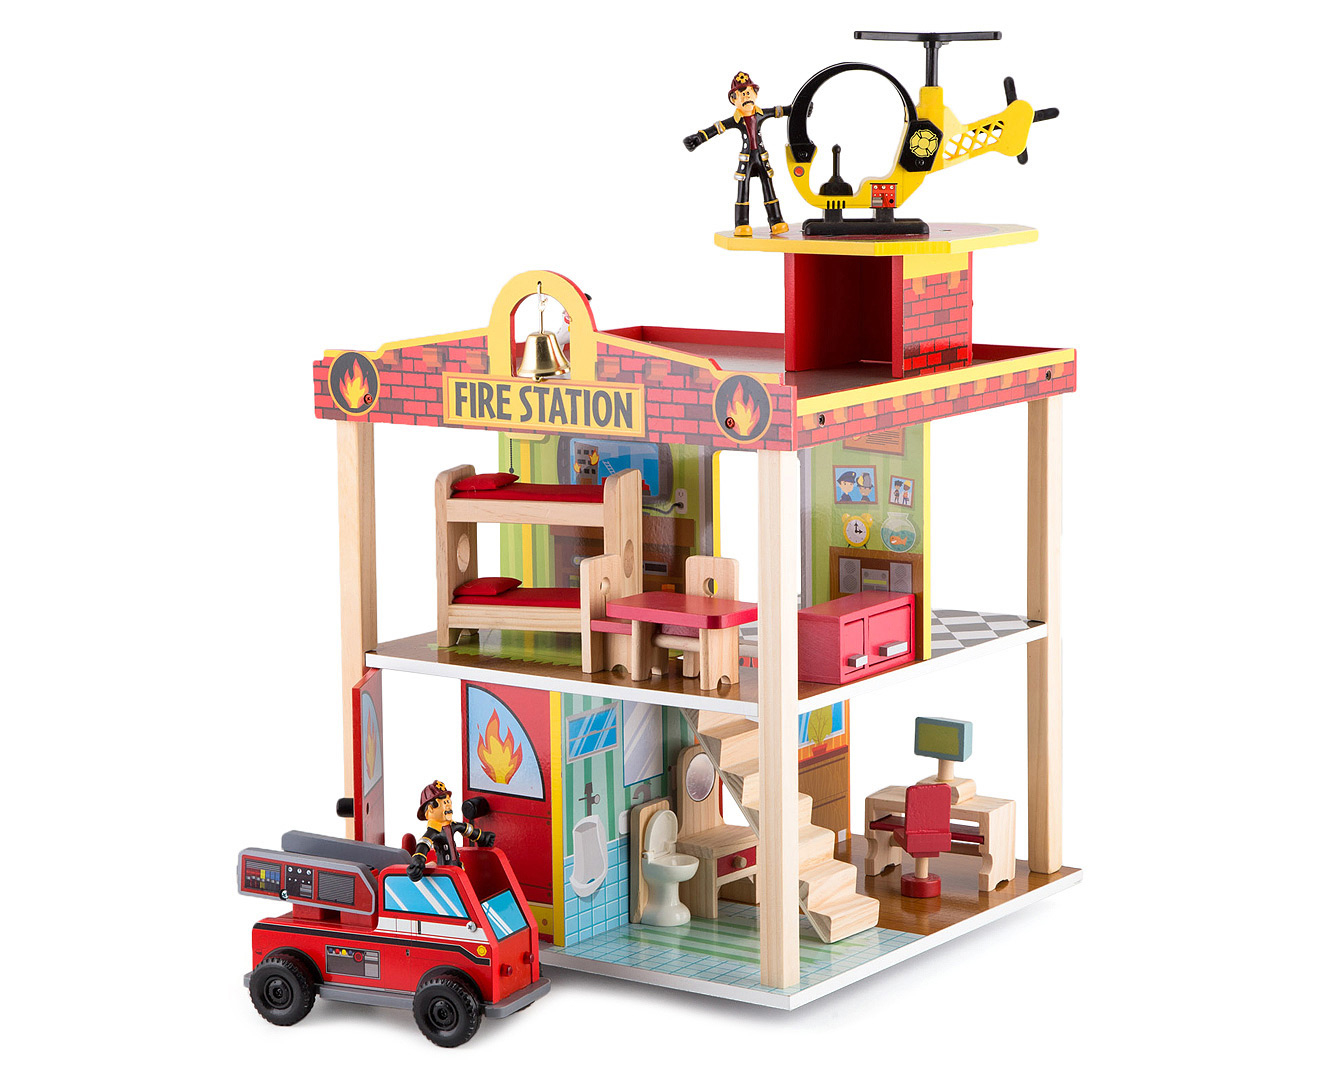 Kidkraft Fire Station Play Set Catchcomau